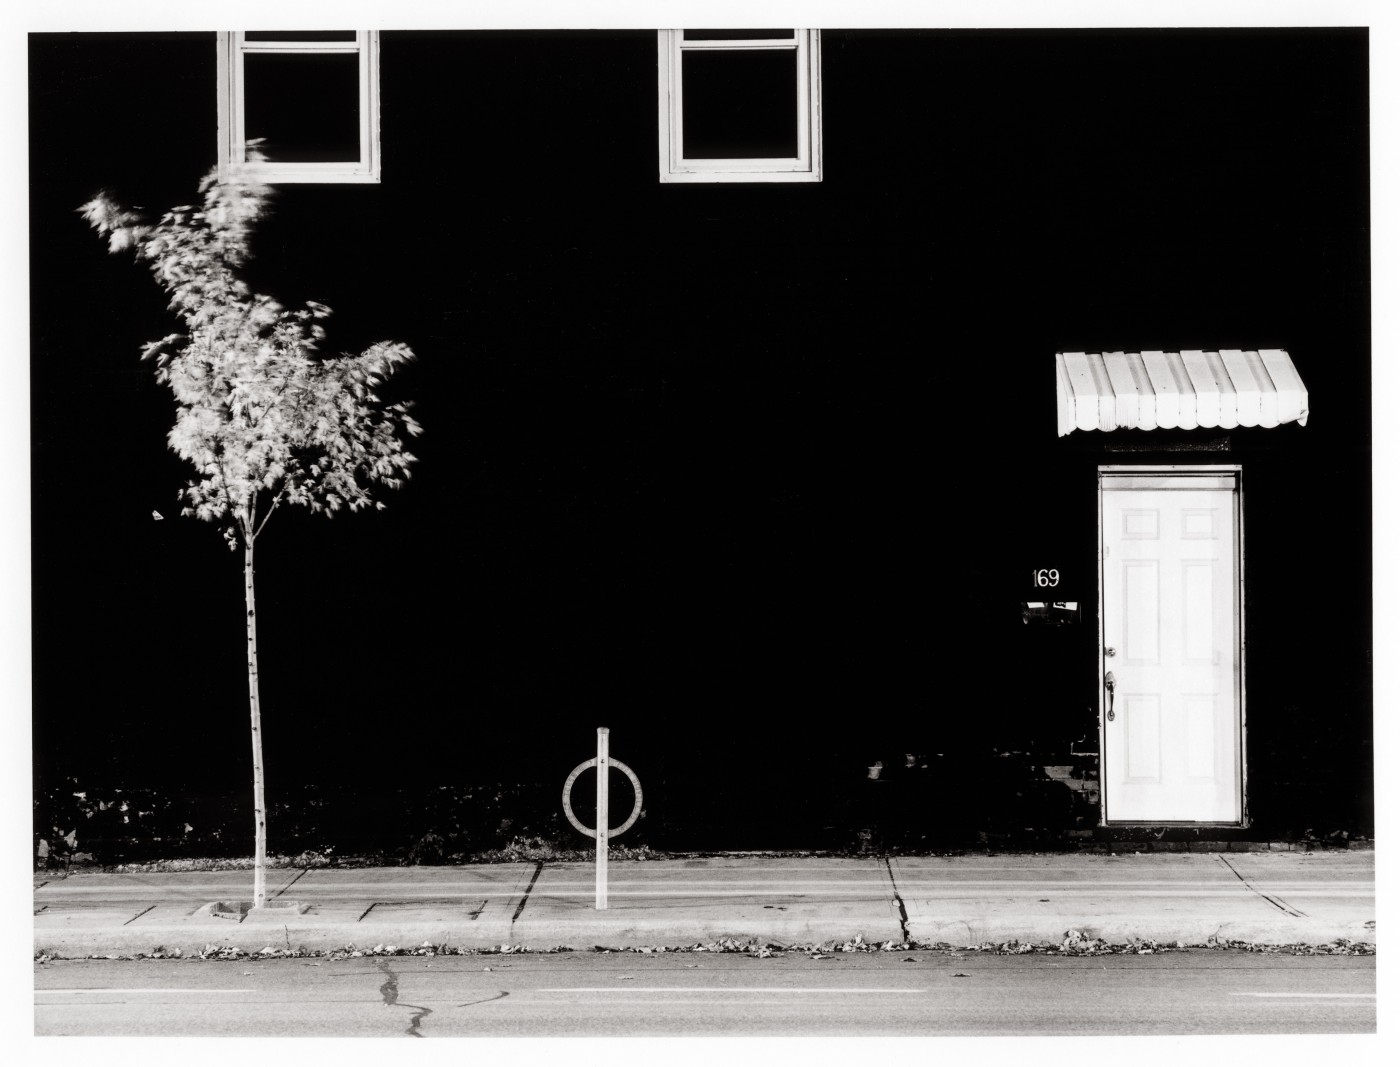 Marco Buonocore, </span><span><em>Untitled, Toronto</em>, </span><span>2006